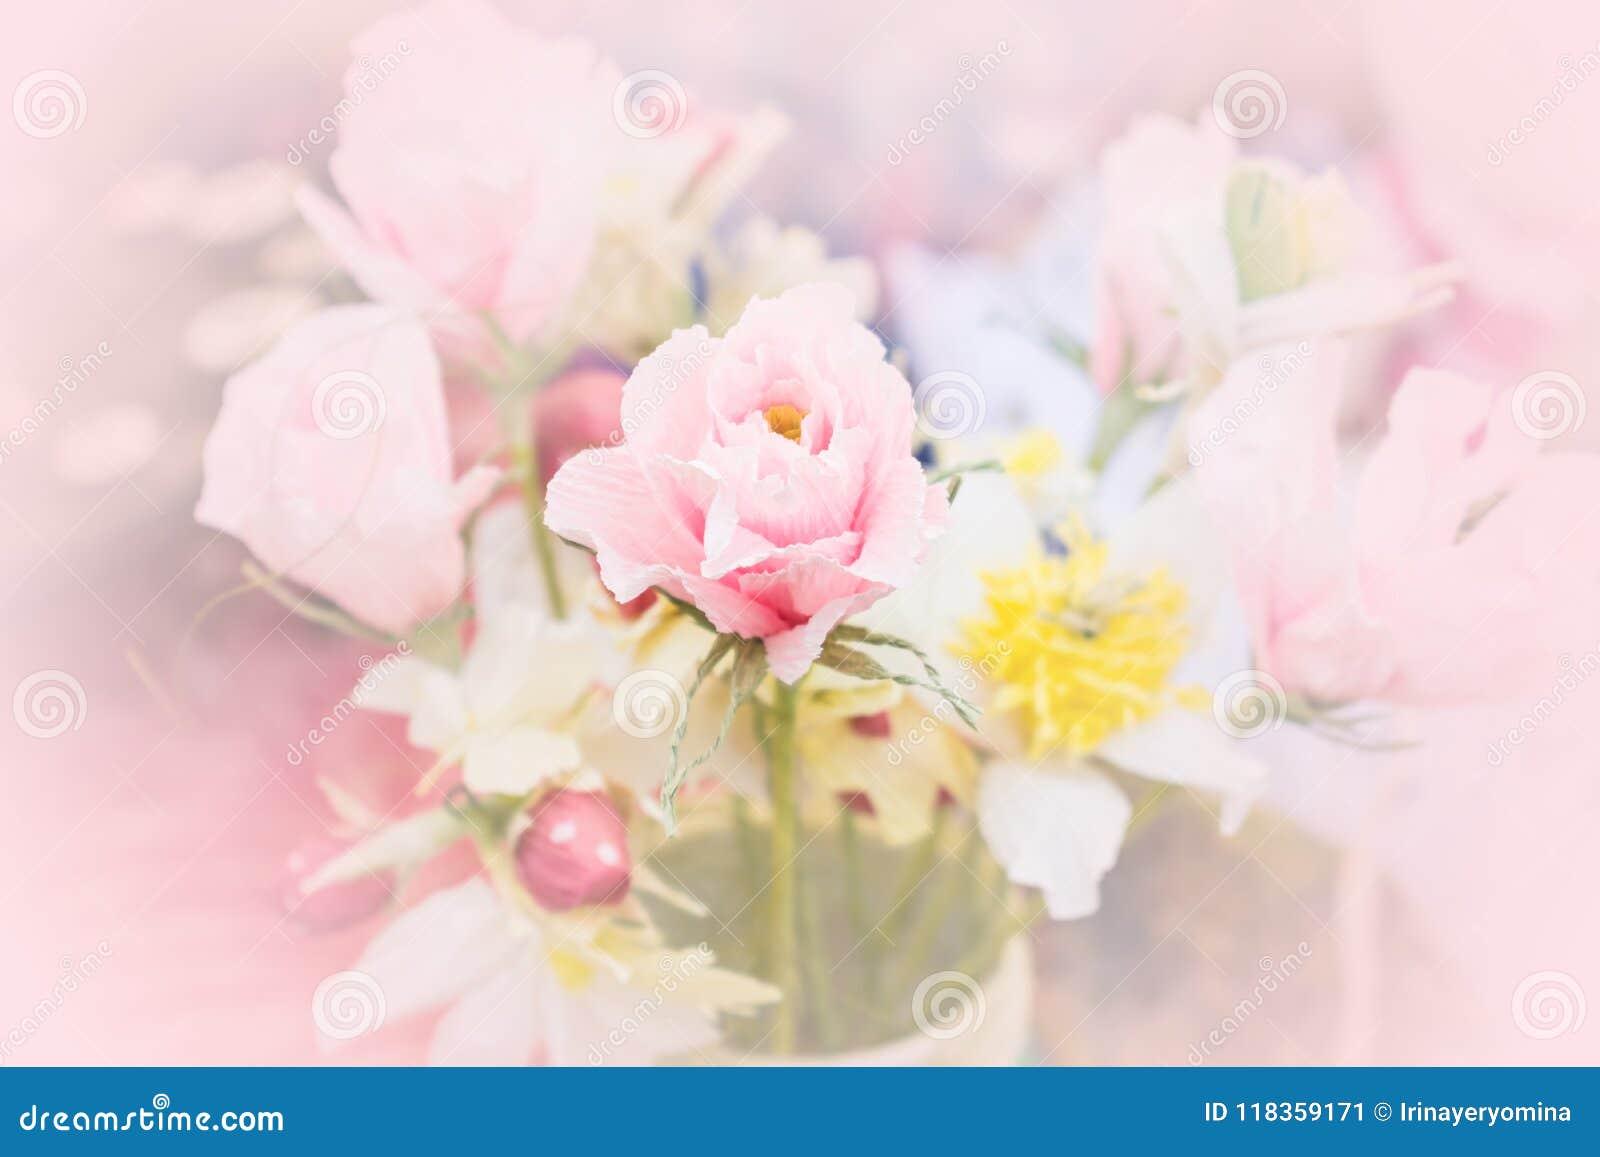 Beautiful Tender Bouquet From Crepe Paper Flower Pink Handmade